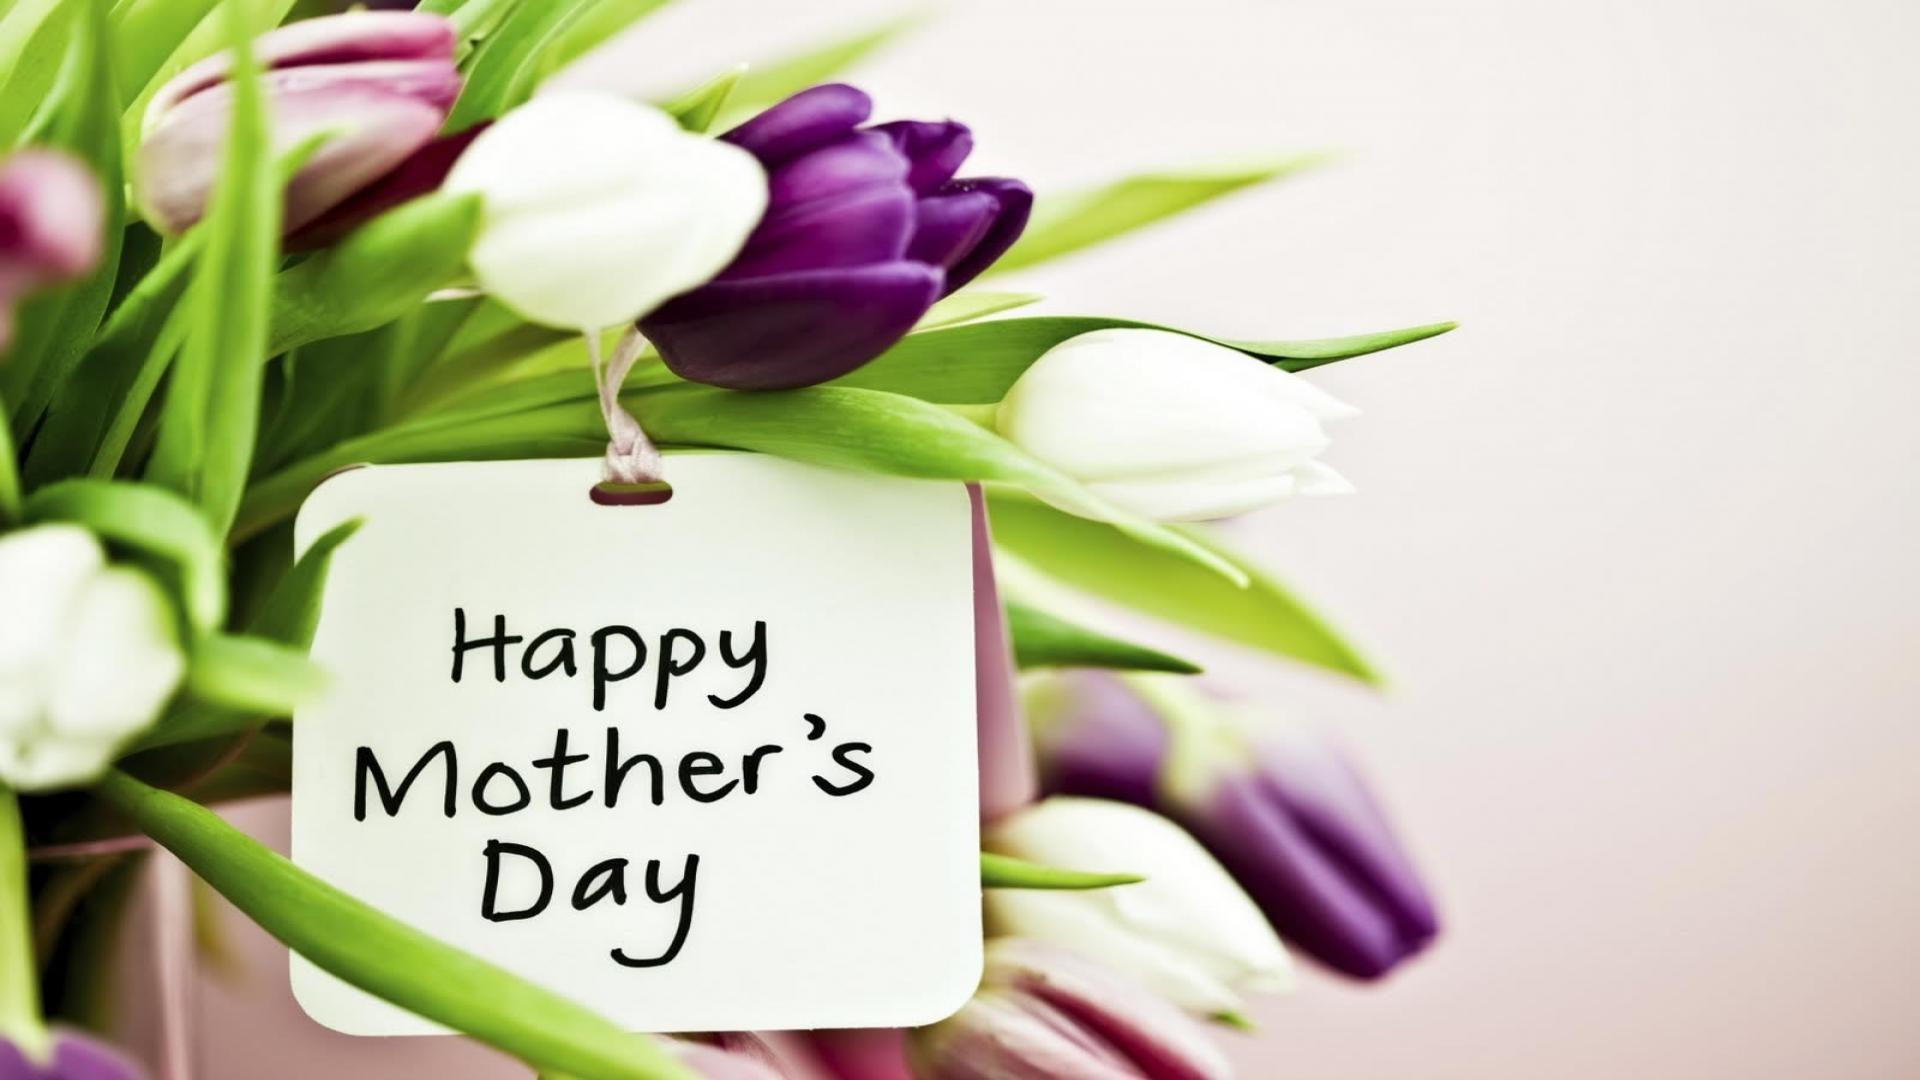 Mothers Day Desktop Wallpapers   Wallpaper High Definition High 1920x1080